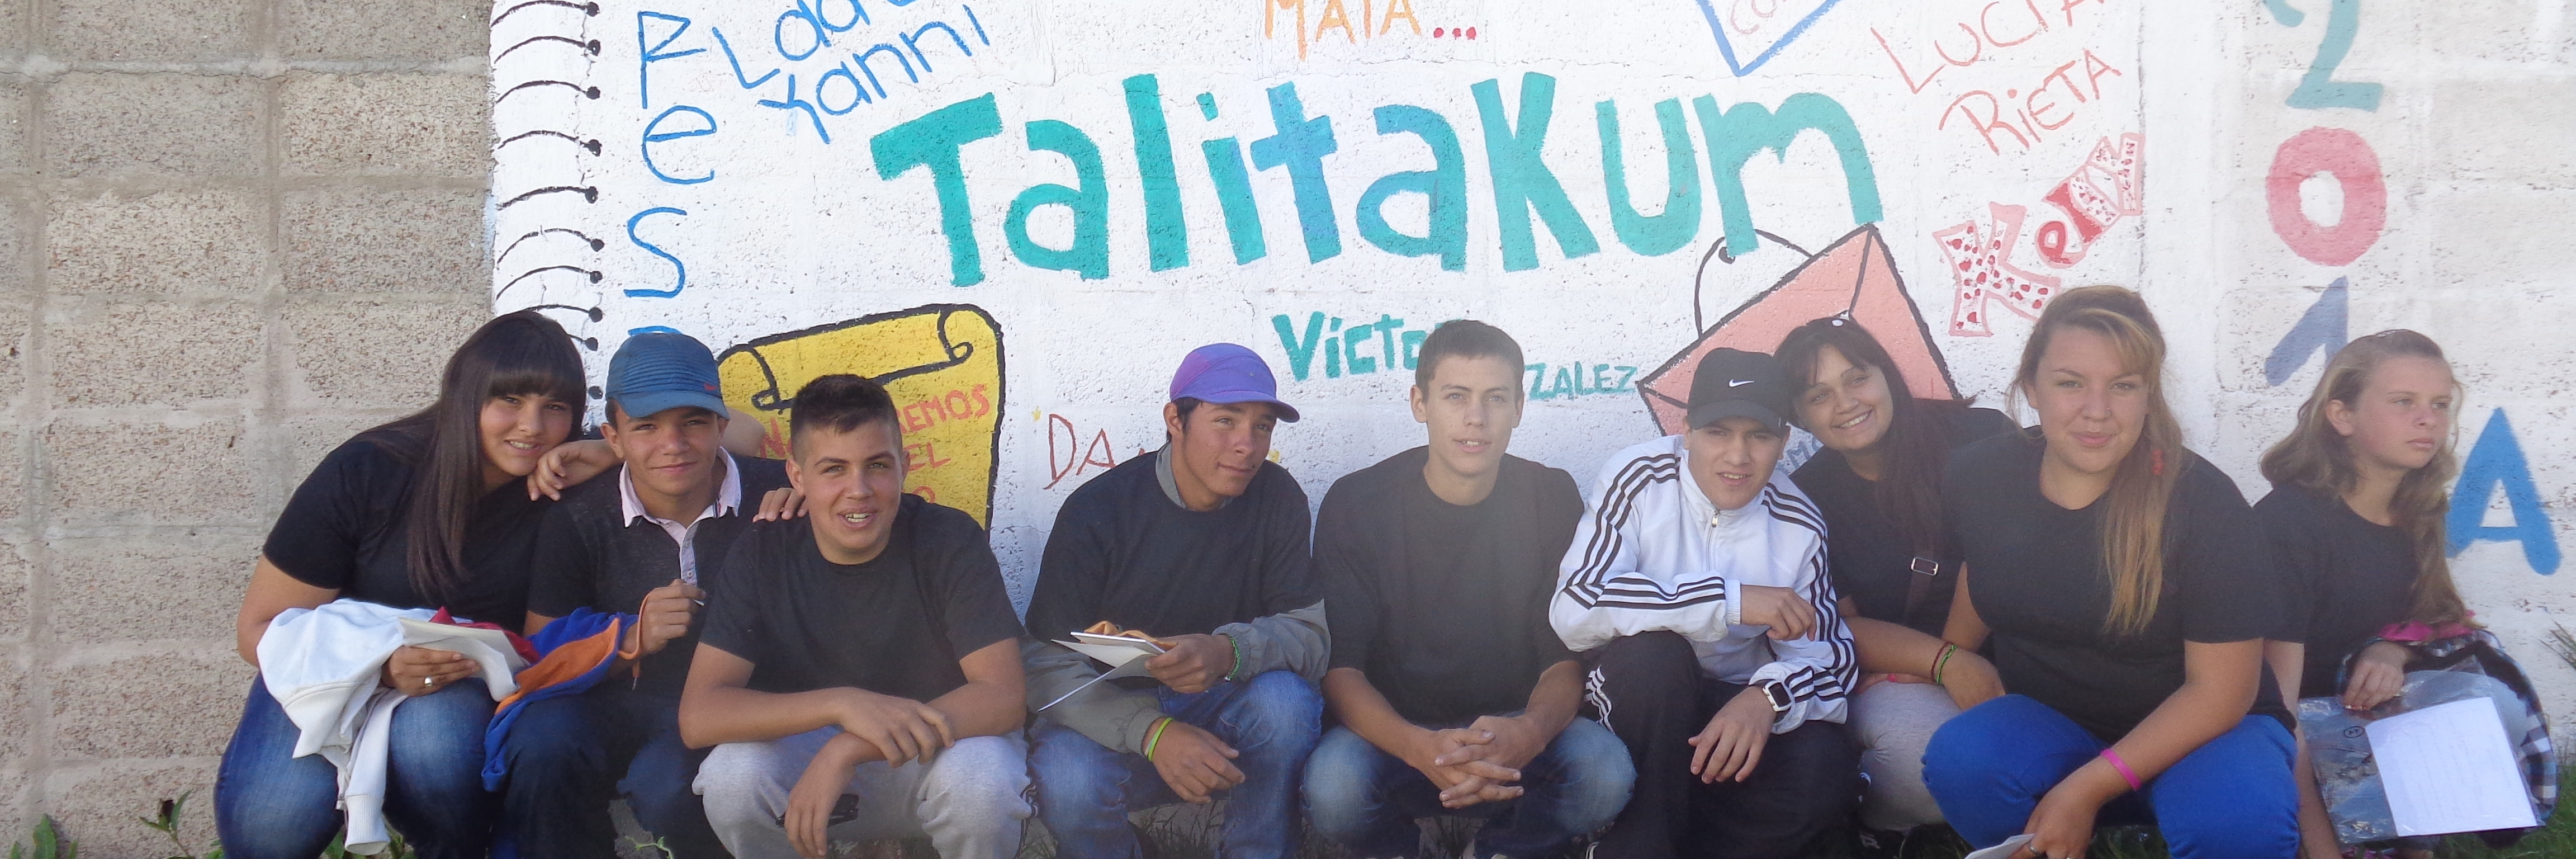 Uruguay - Notizie dal politecnico Talitakum